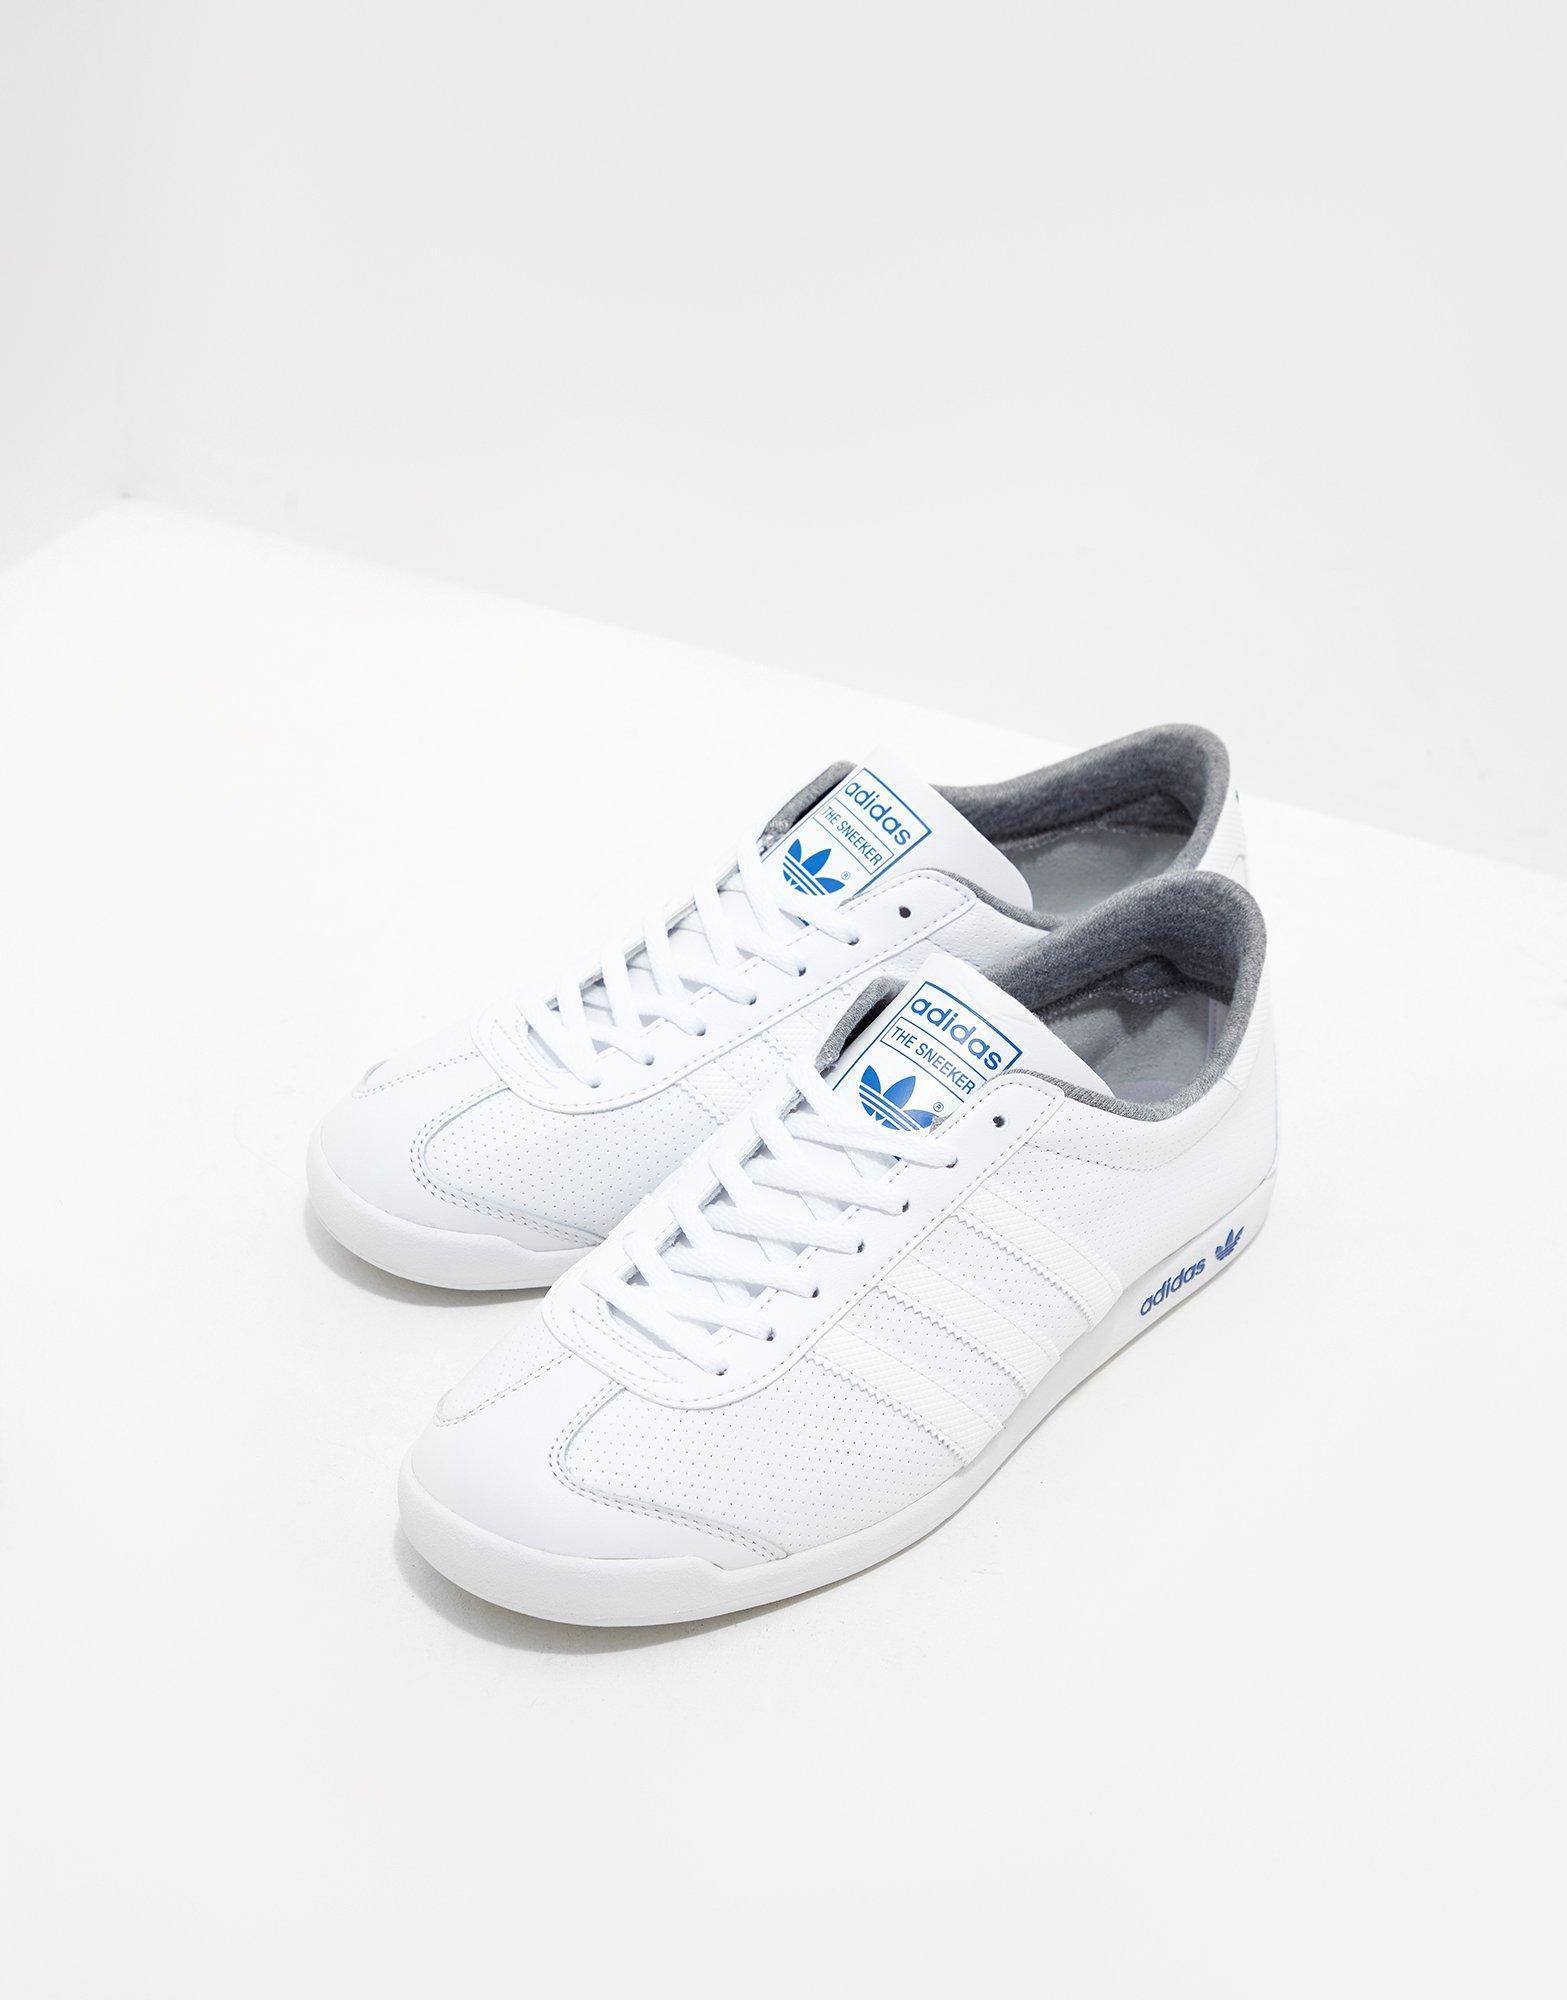 0fb787ca73 Lyst - adidas Originals The Sneeker White in White for Men